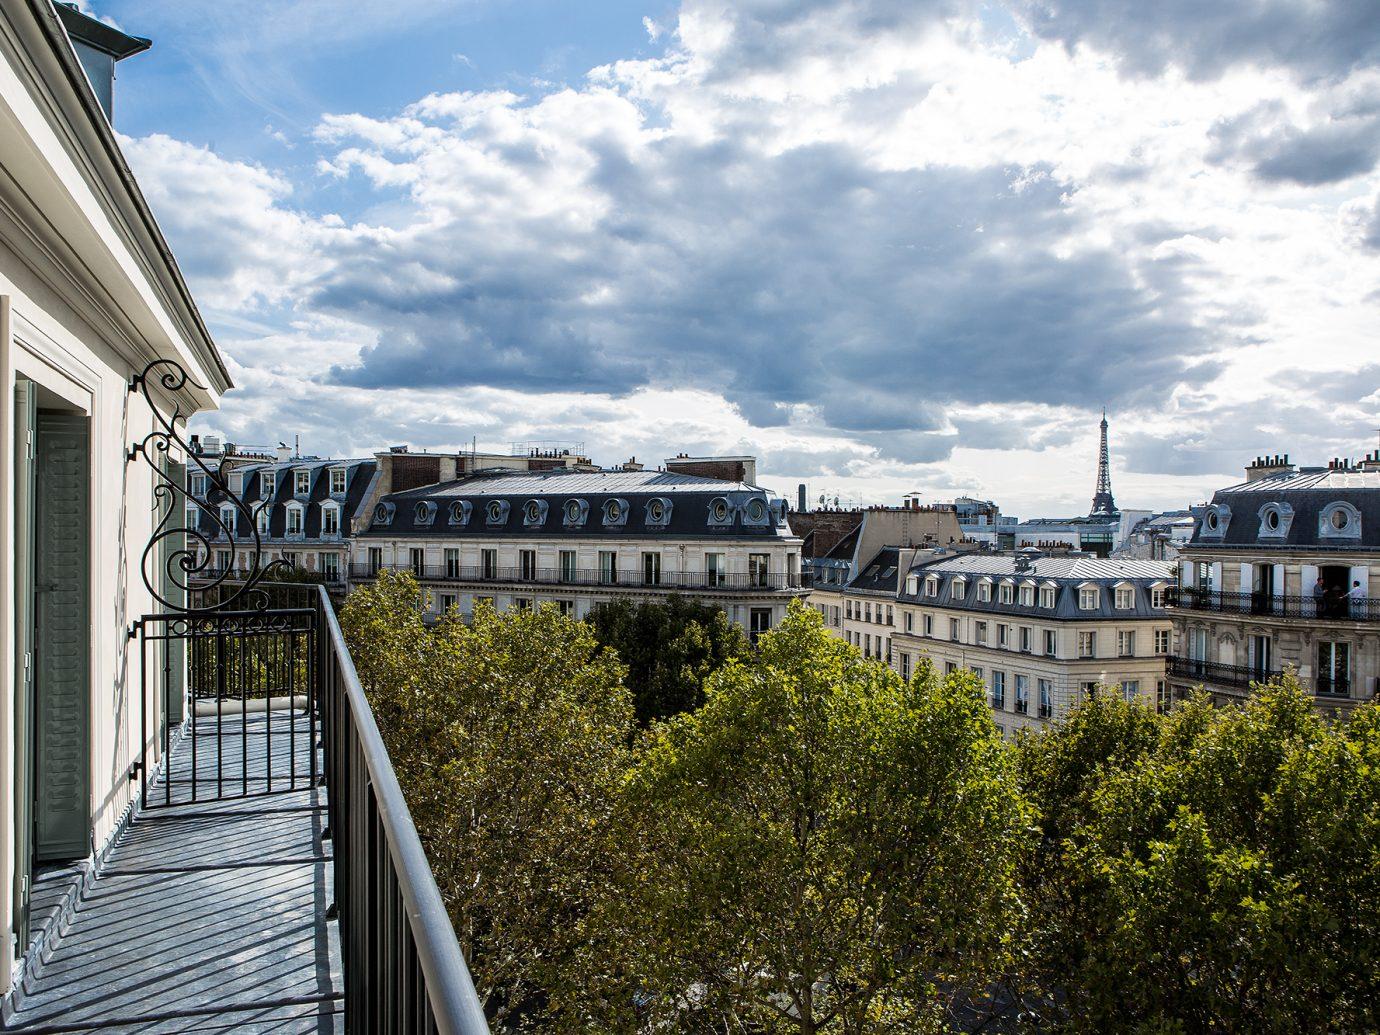 Balcony view at the Hotel Fauchon